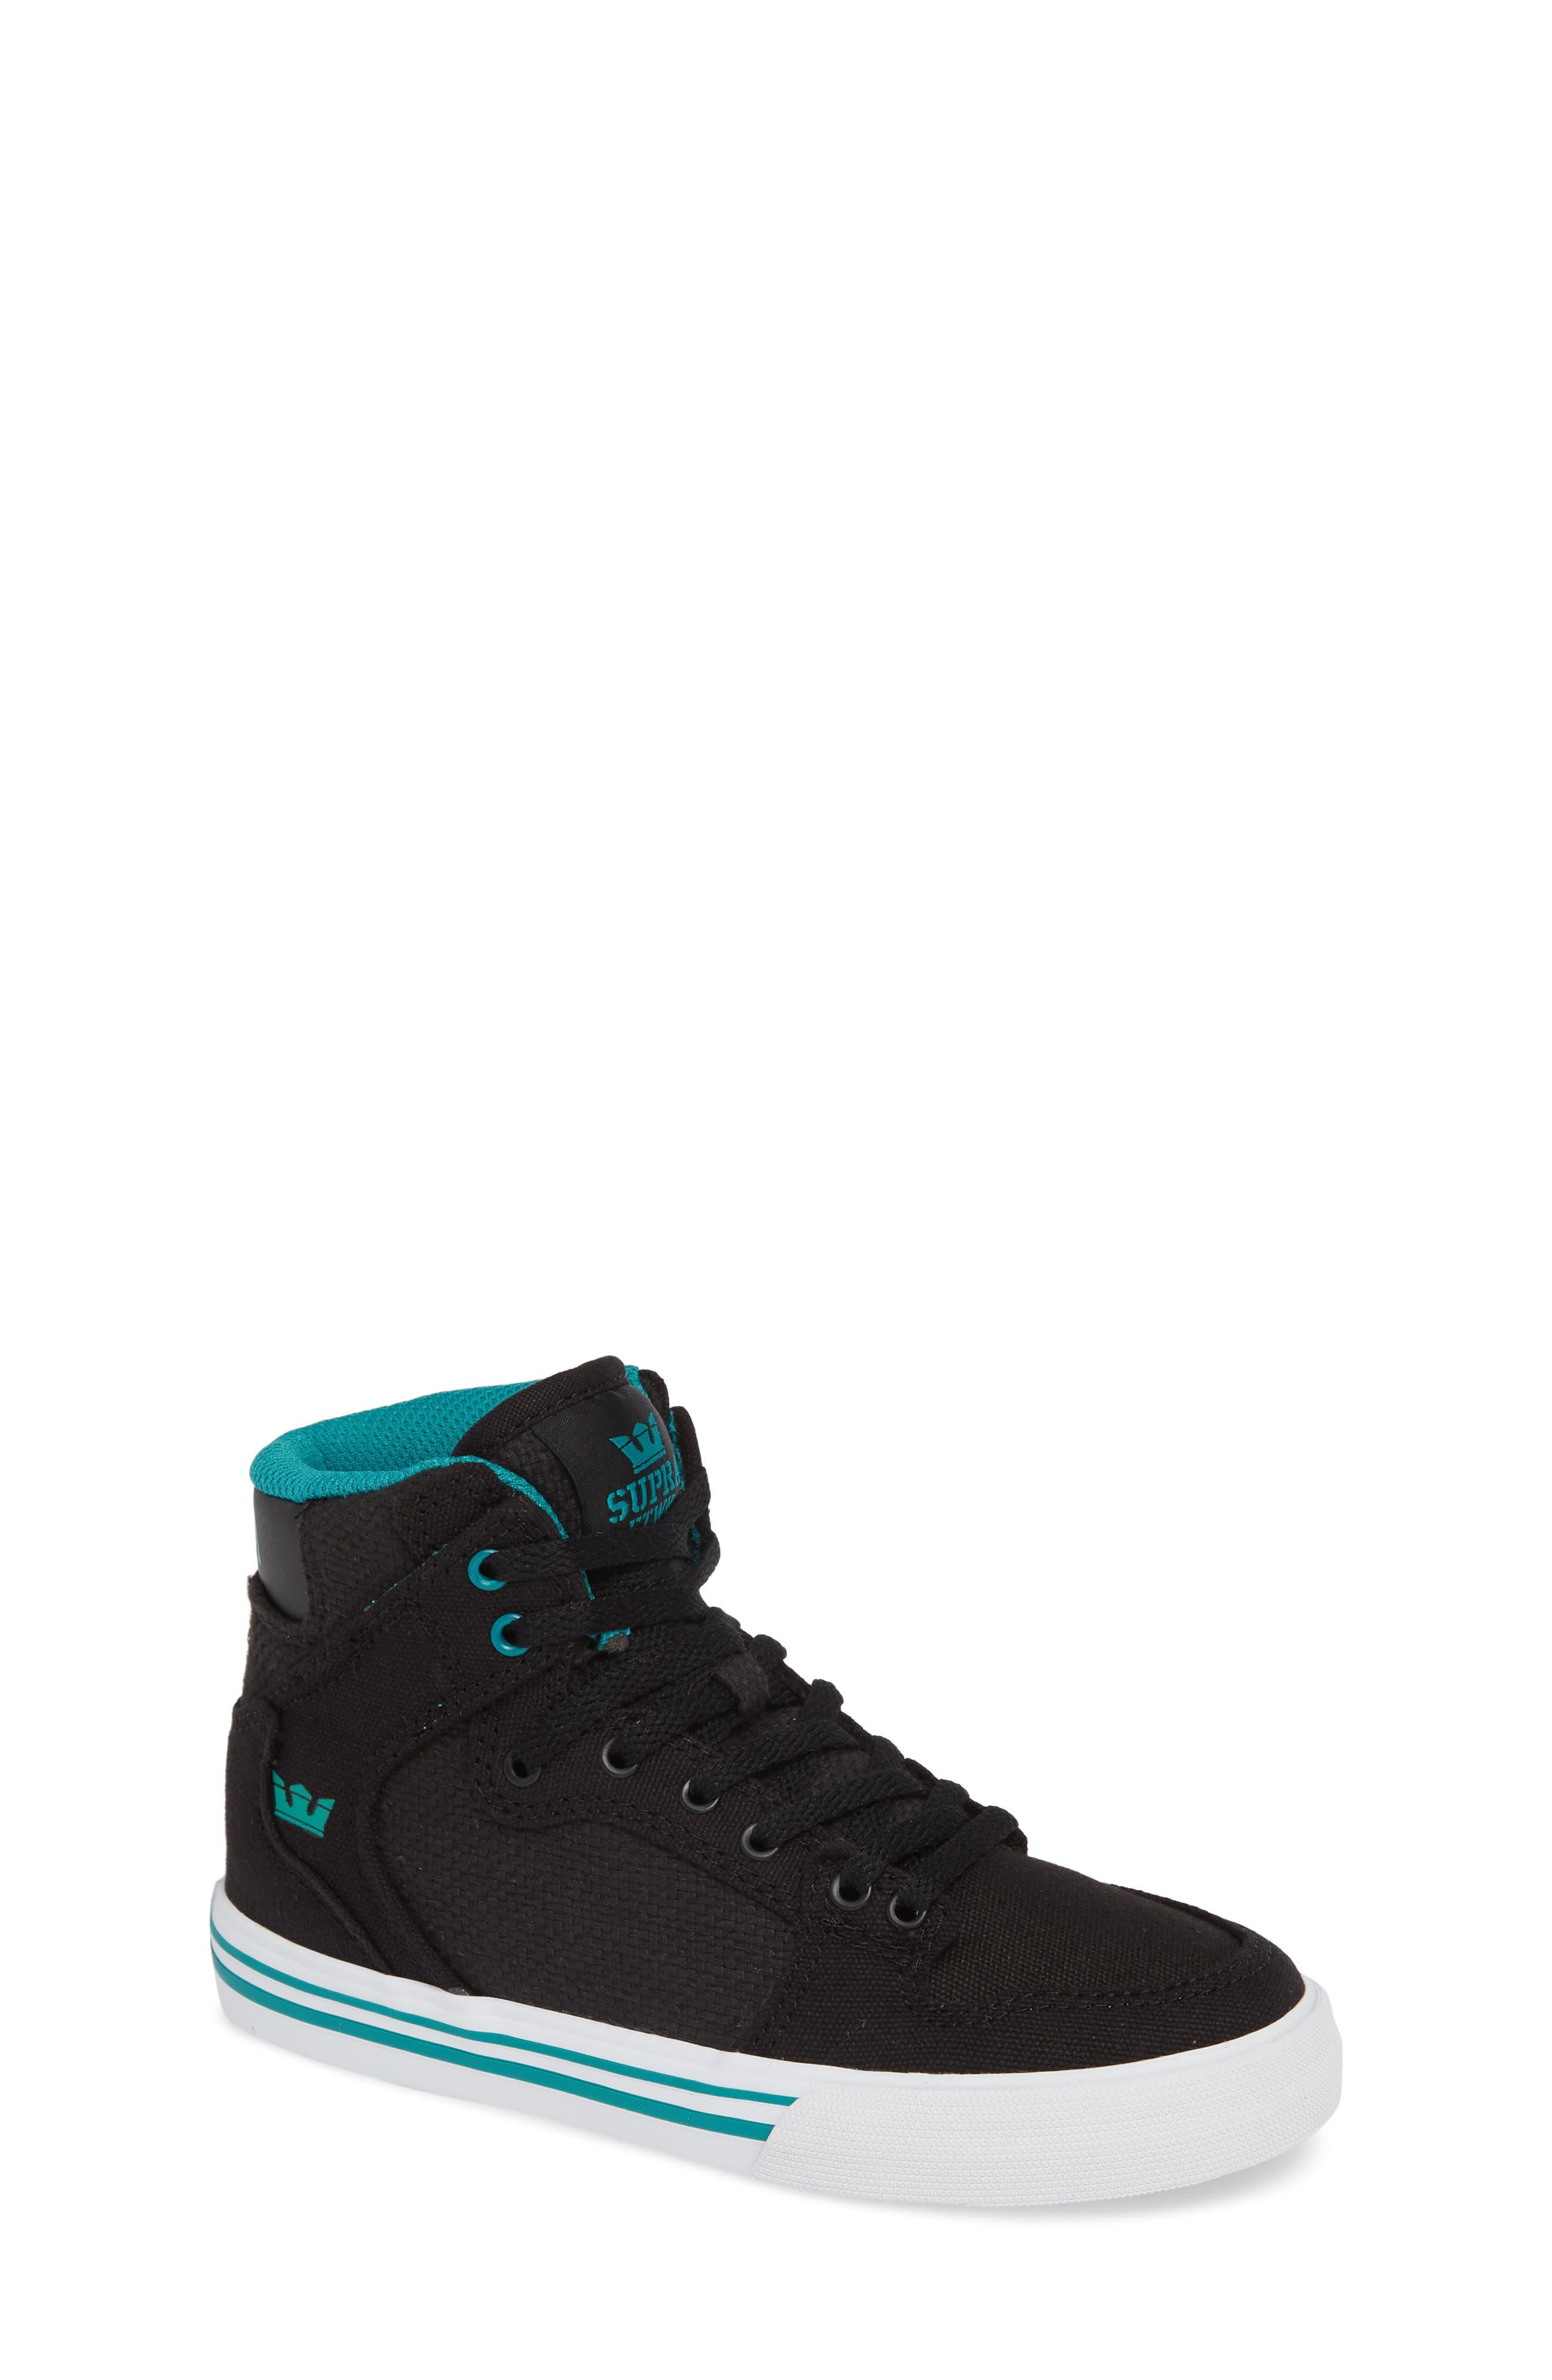 'Vaider' High Top Sneaker,                             Main thumbnail 1, color,                             BLACK/ TEAL